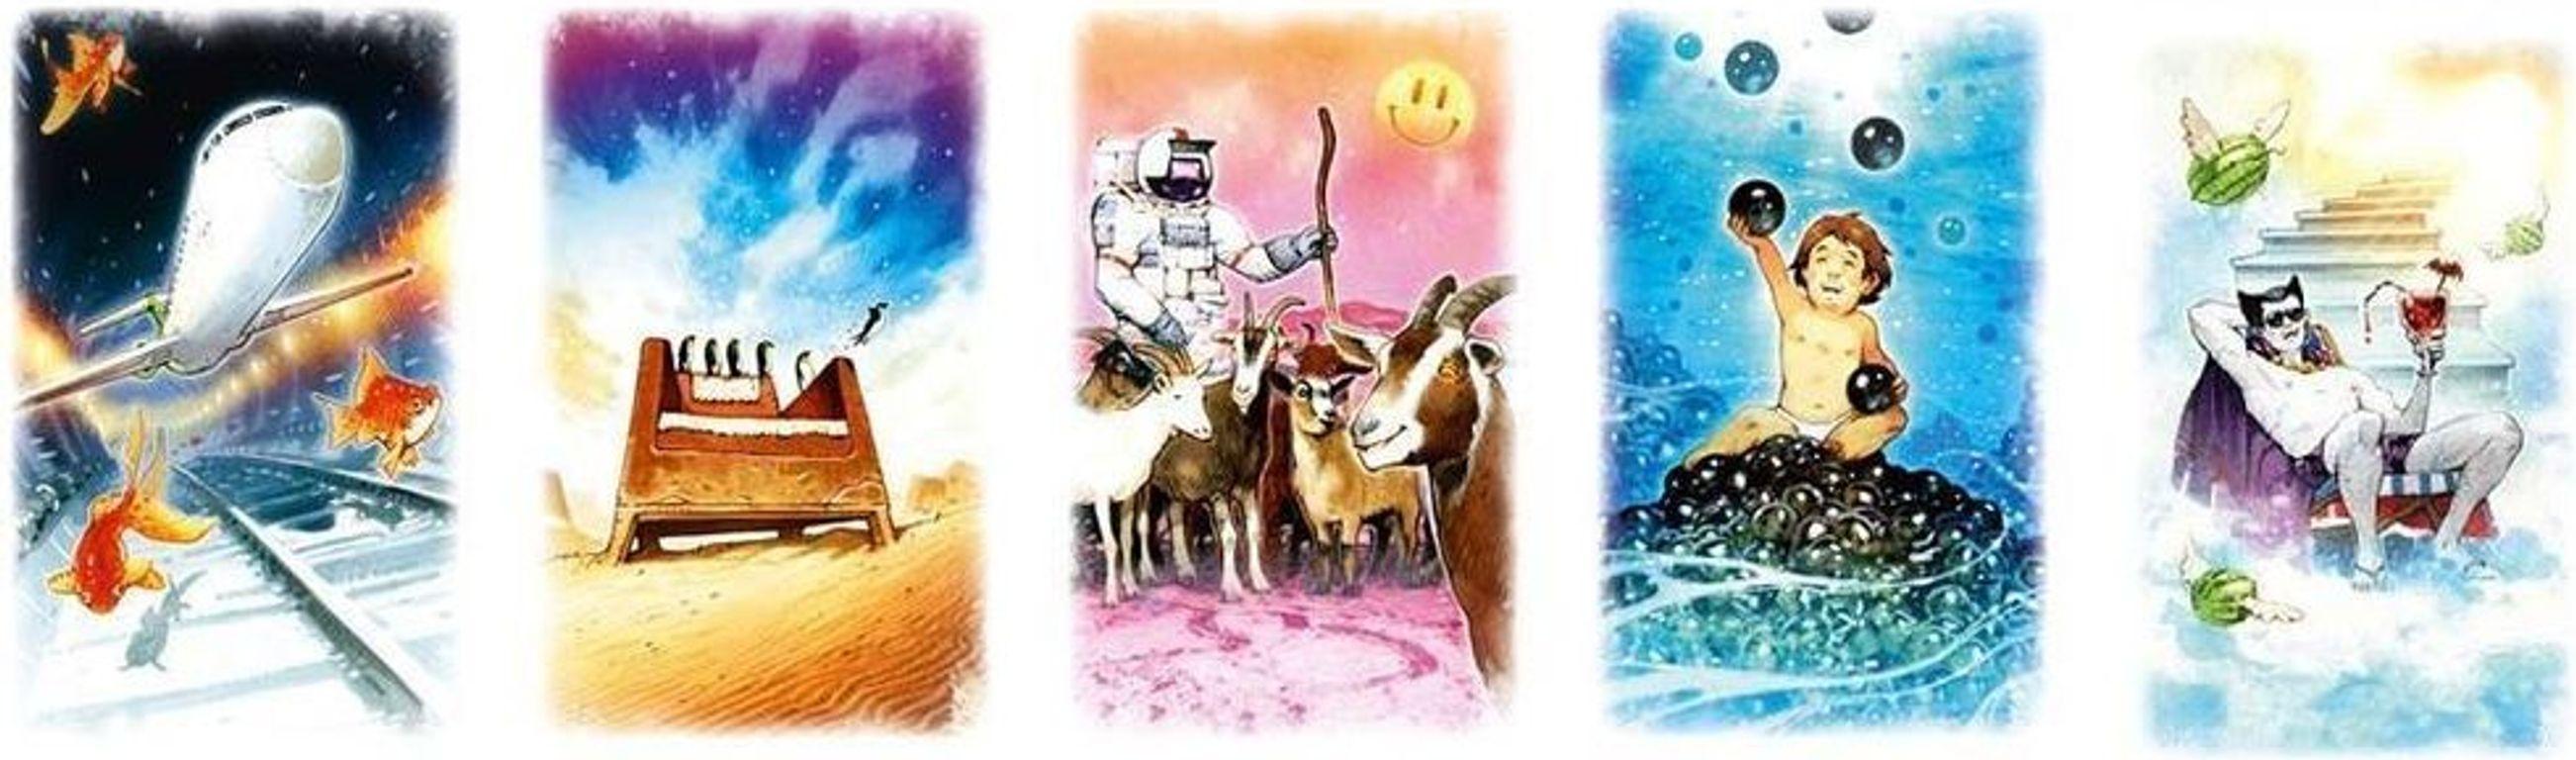 When I Dream cards